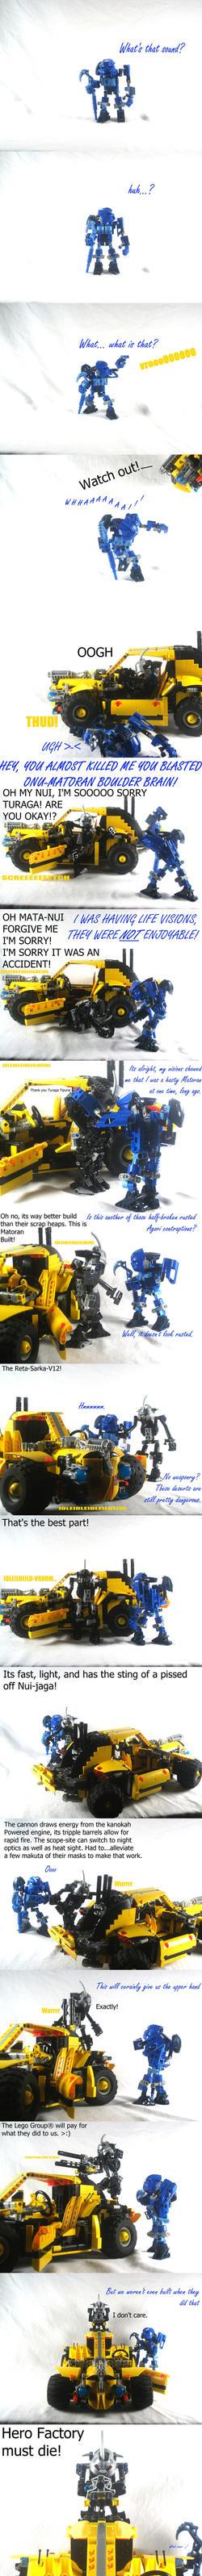 Bionicle MOCery: Revealing Vengence by Mana-Ramp-Matoran